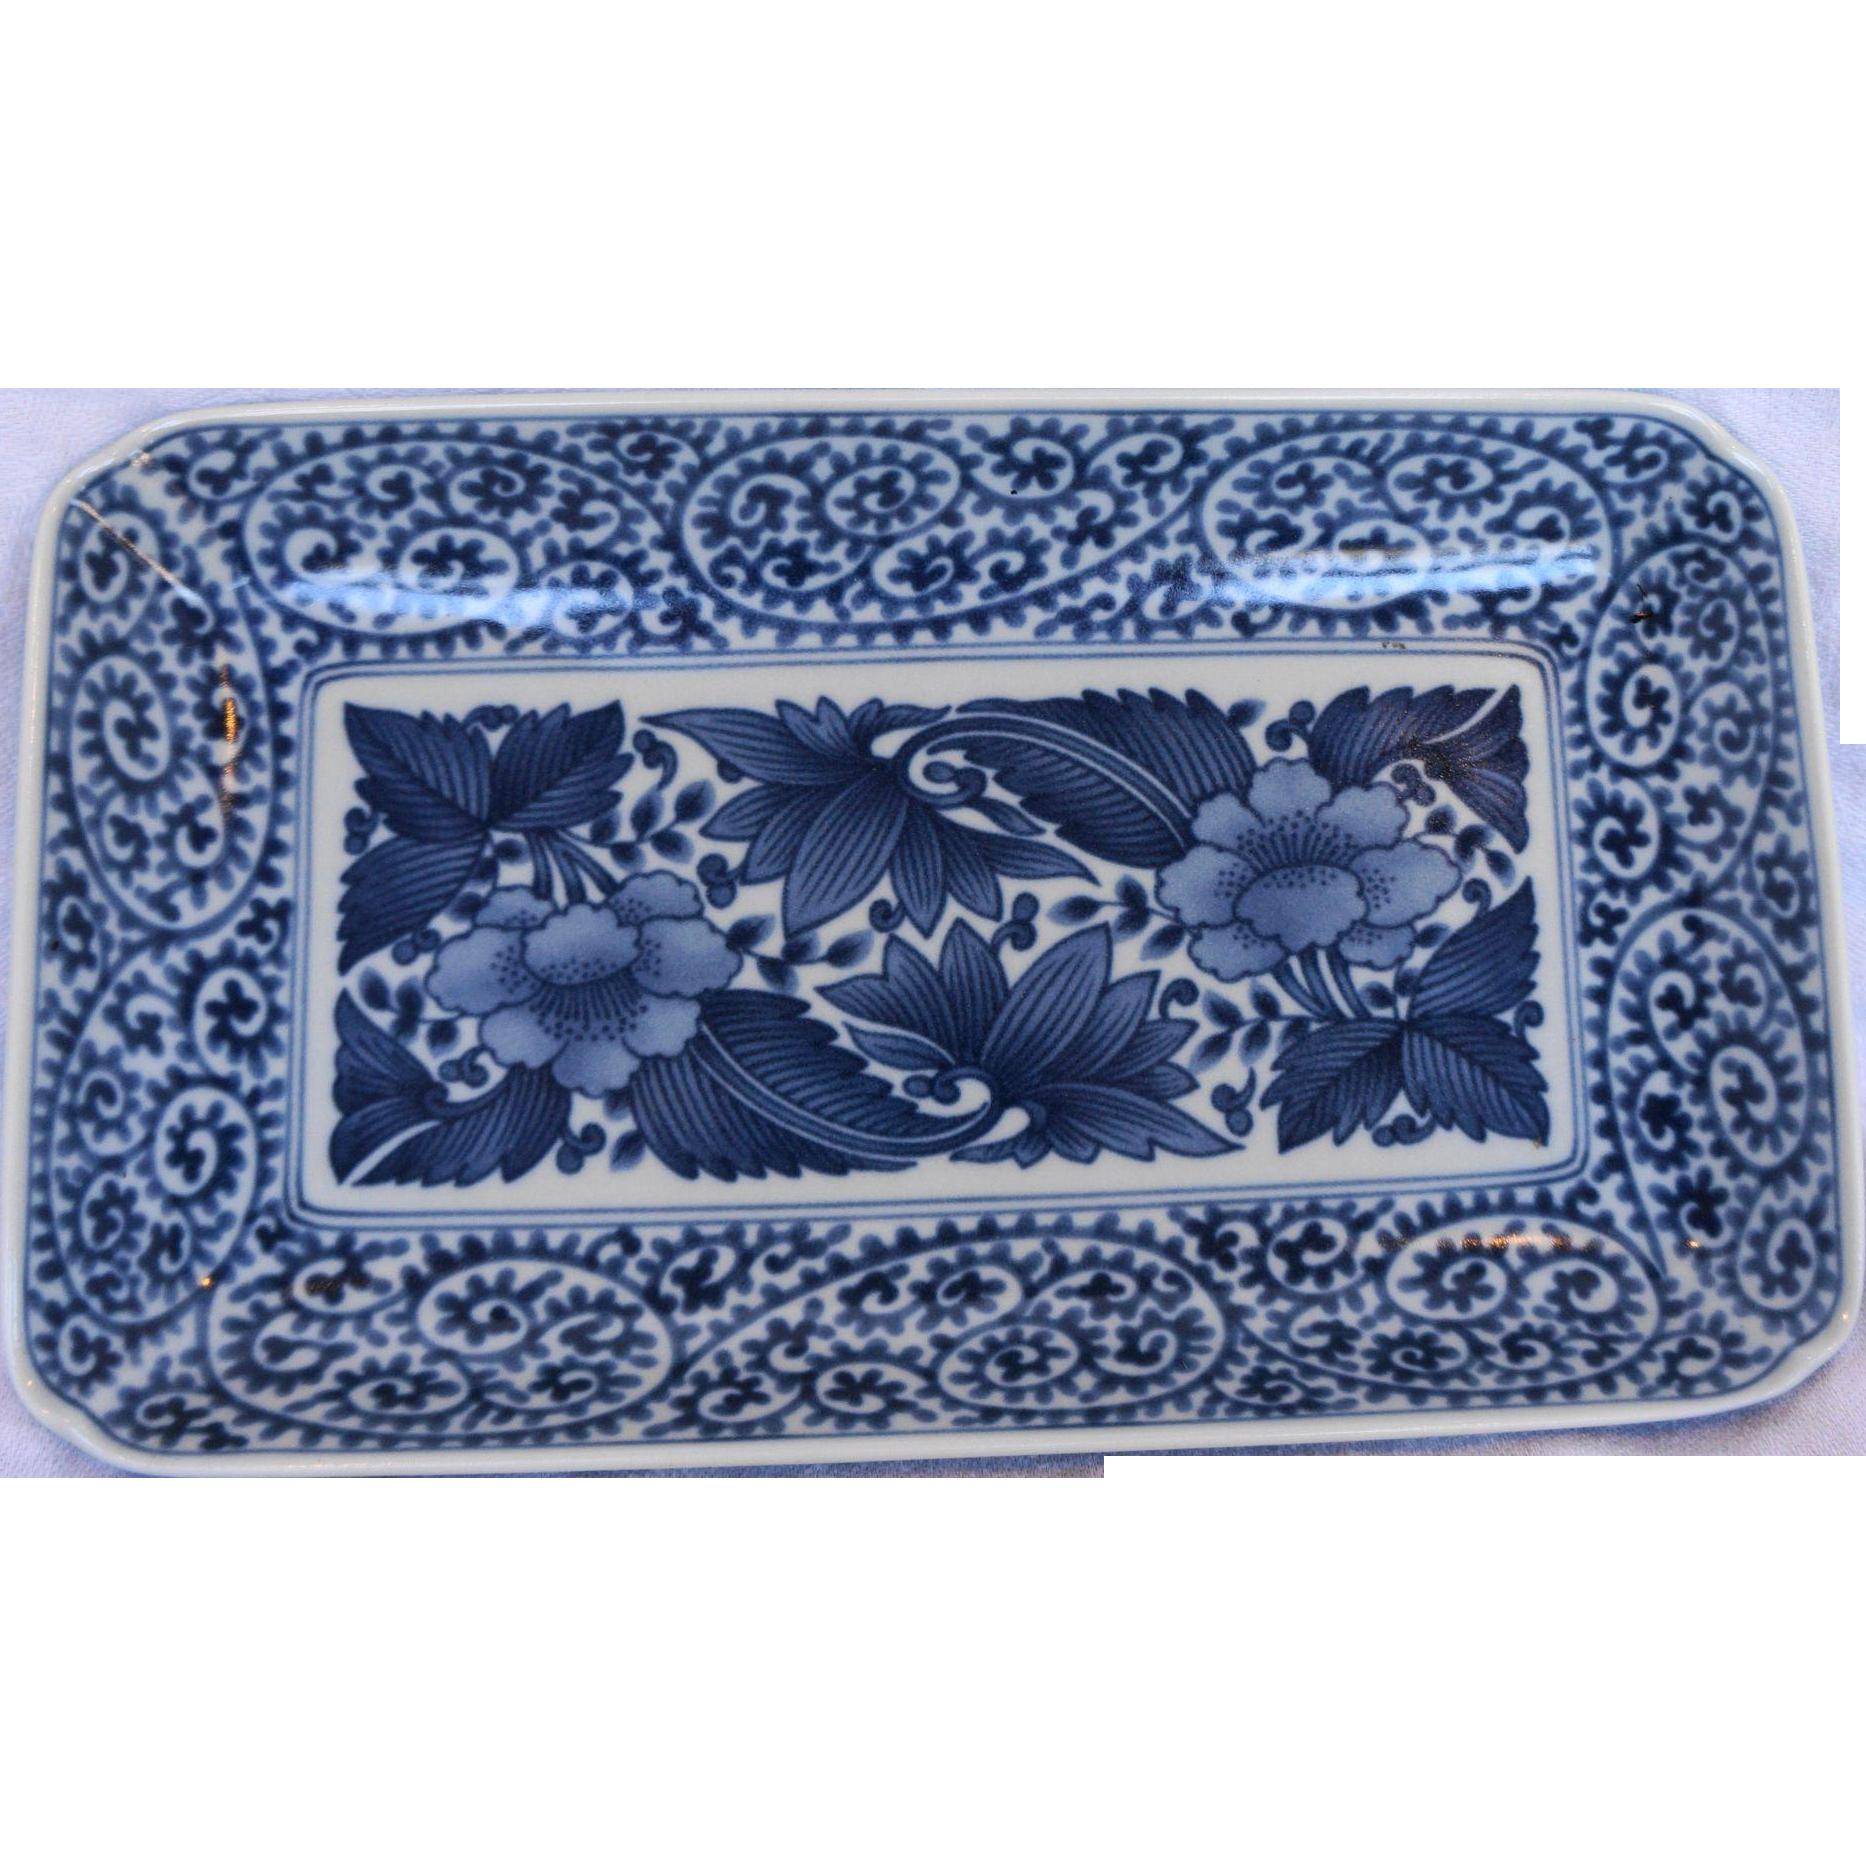 Ryu Ho Ryuho Mino Ware Japanese Porcelain Blue Hand Painted Floral Pin Dish Tray